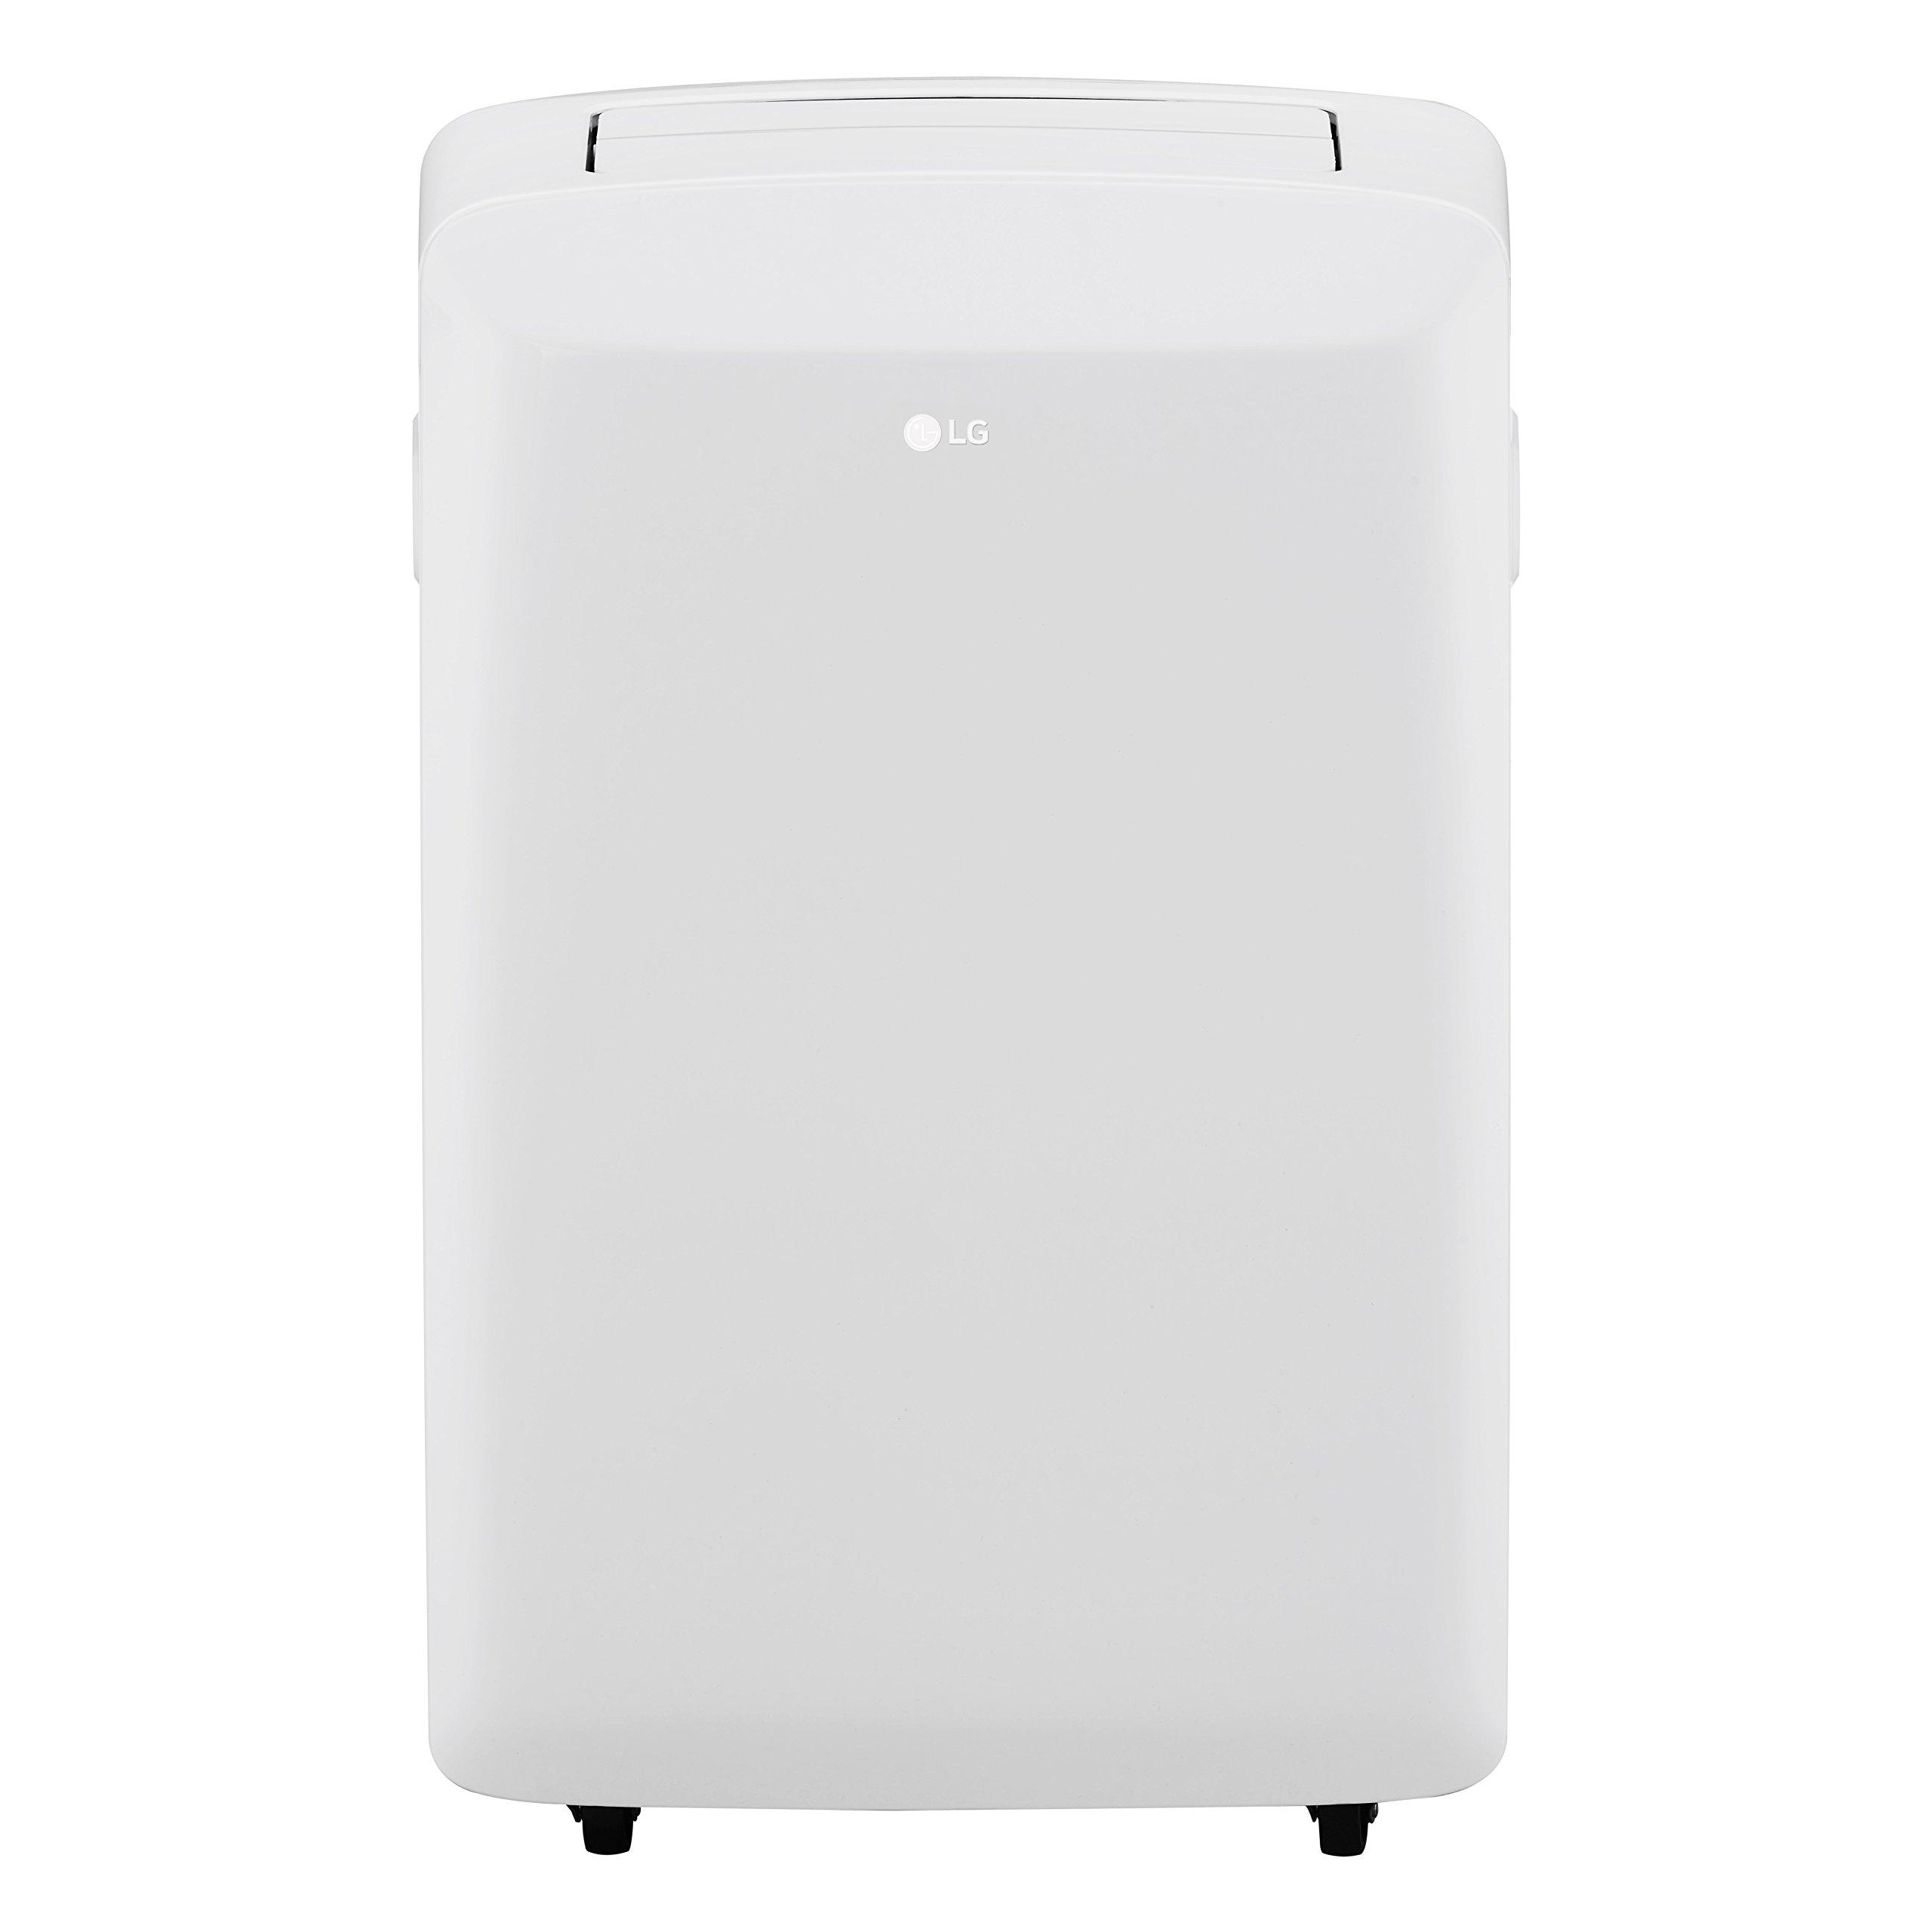 LG LP0817WSR Portable Conditioner Control